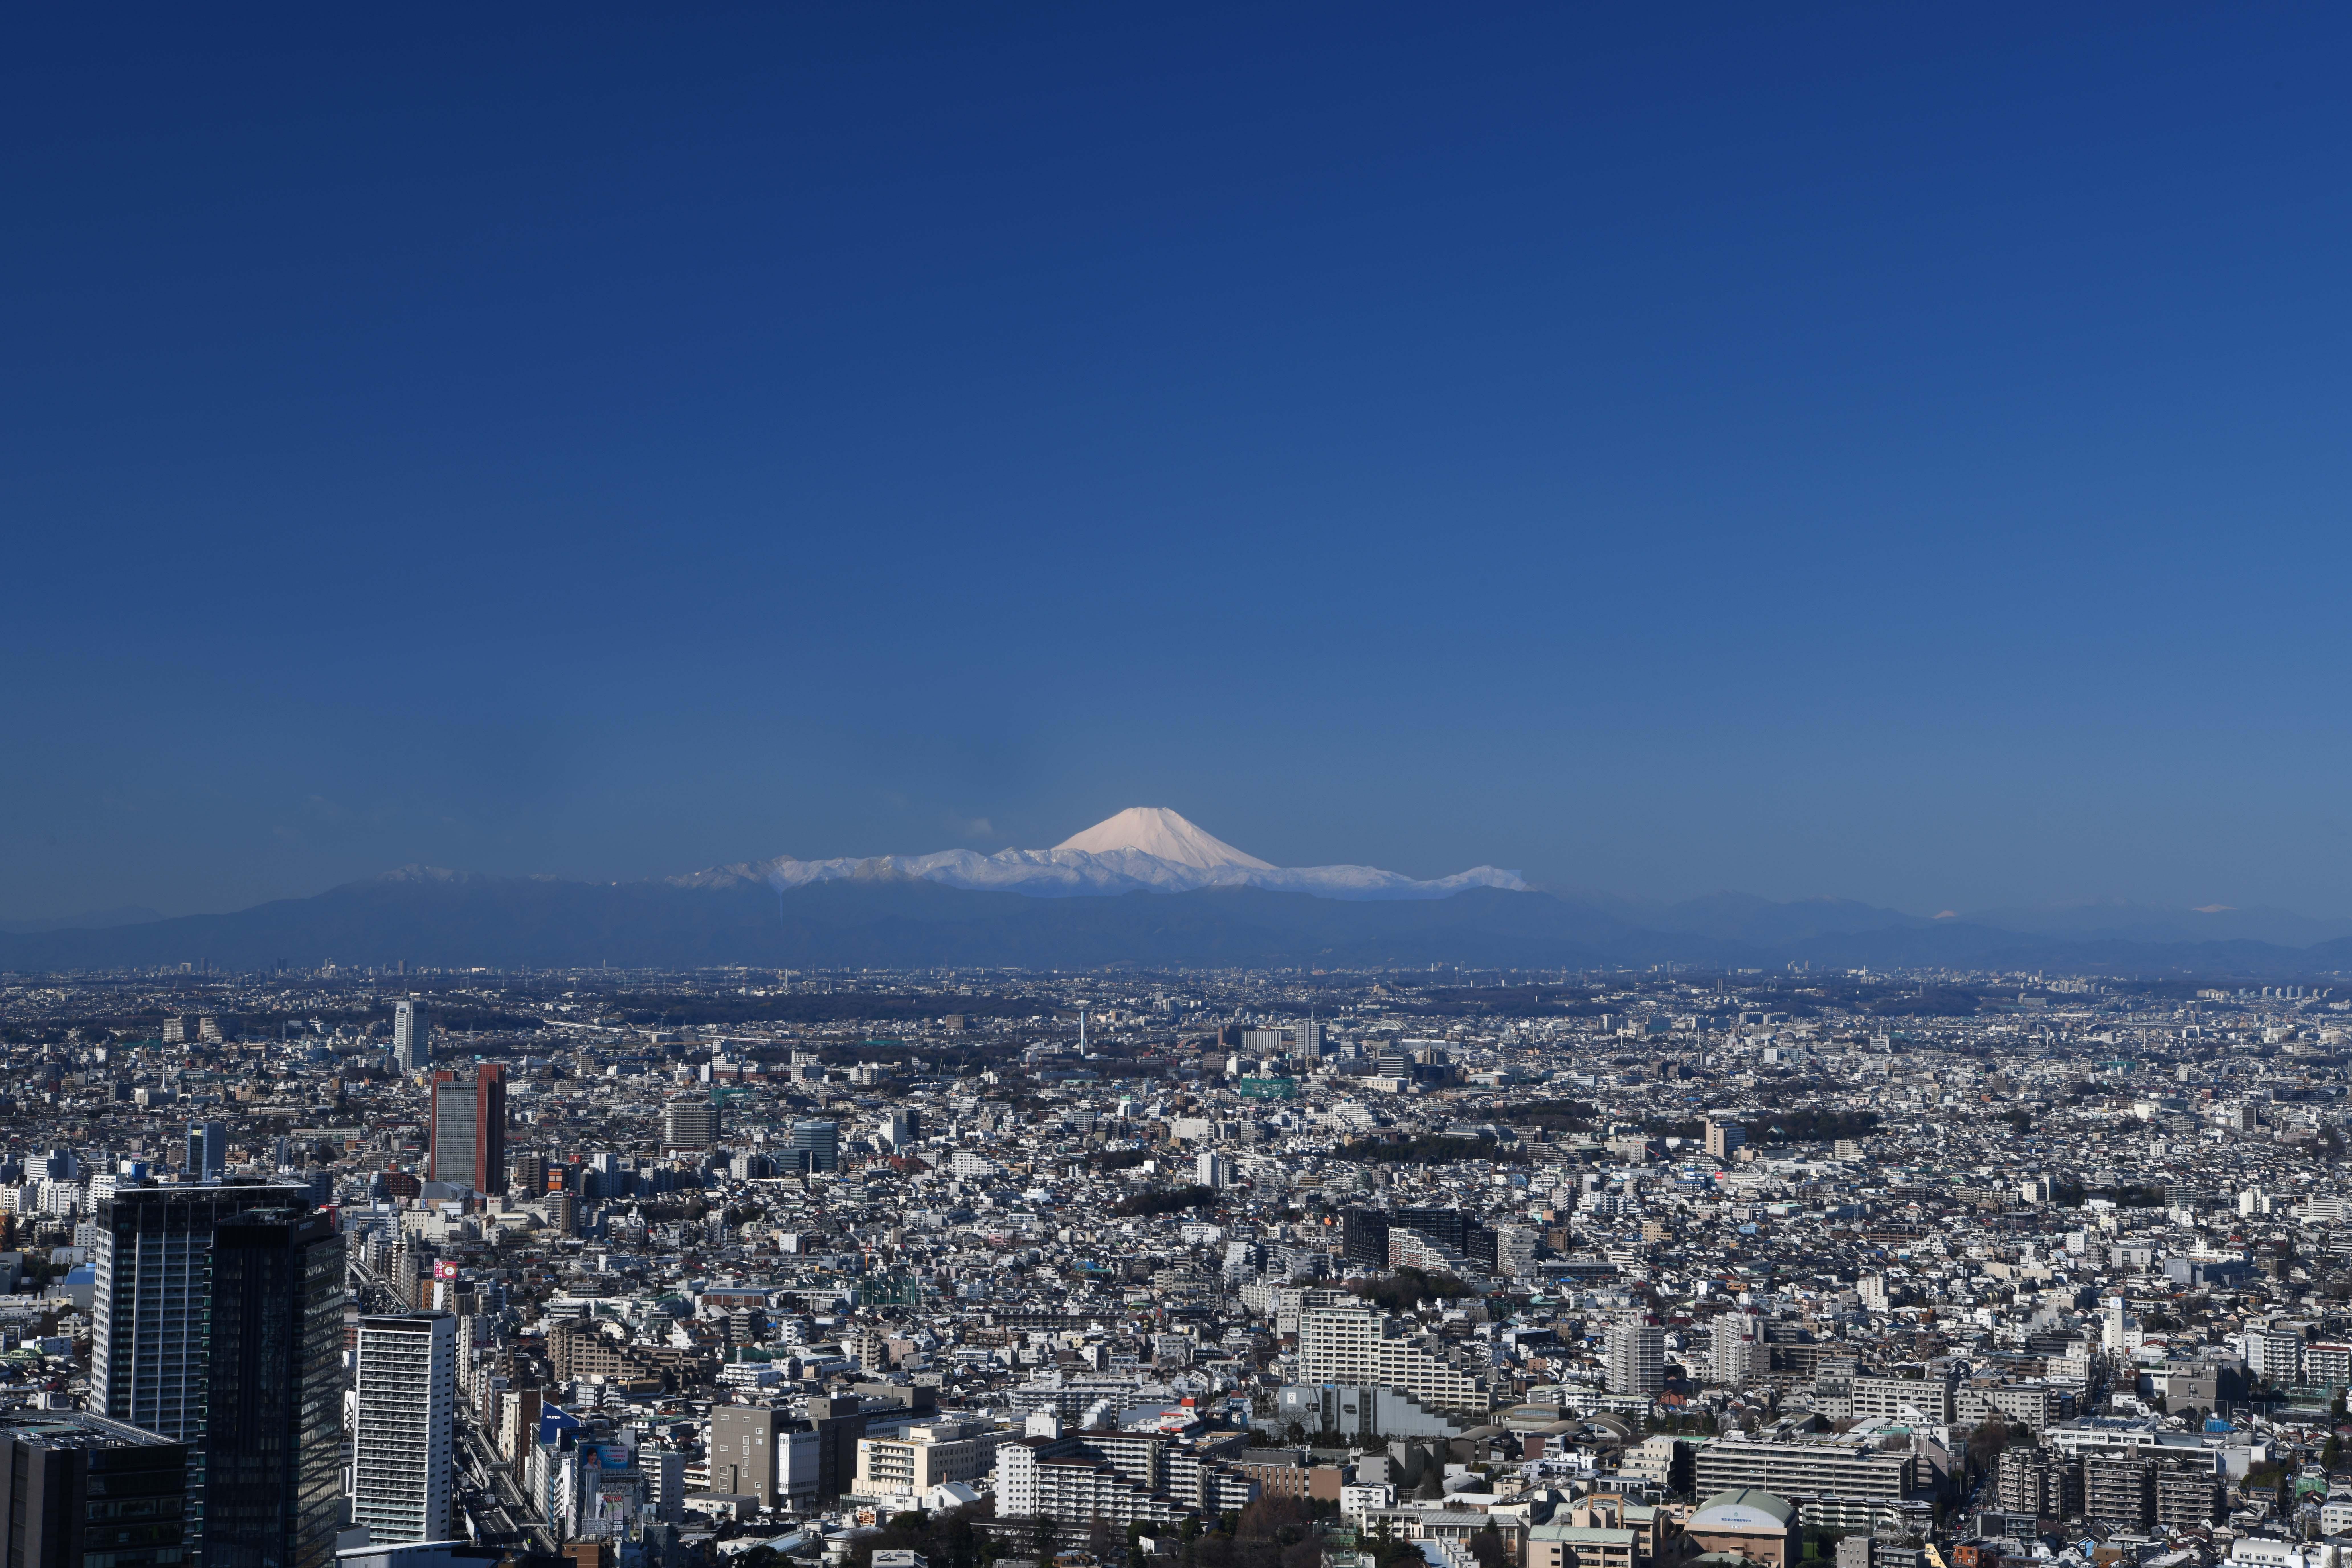 shibuya sky tokyo new landmark night view fuji mountain